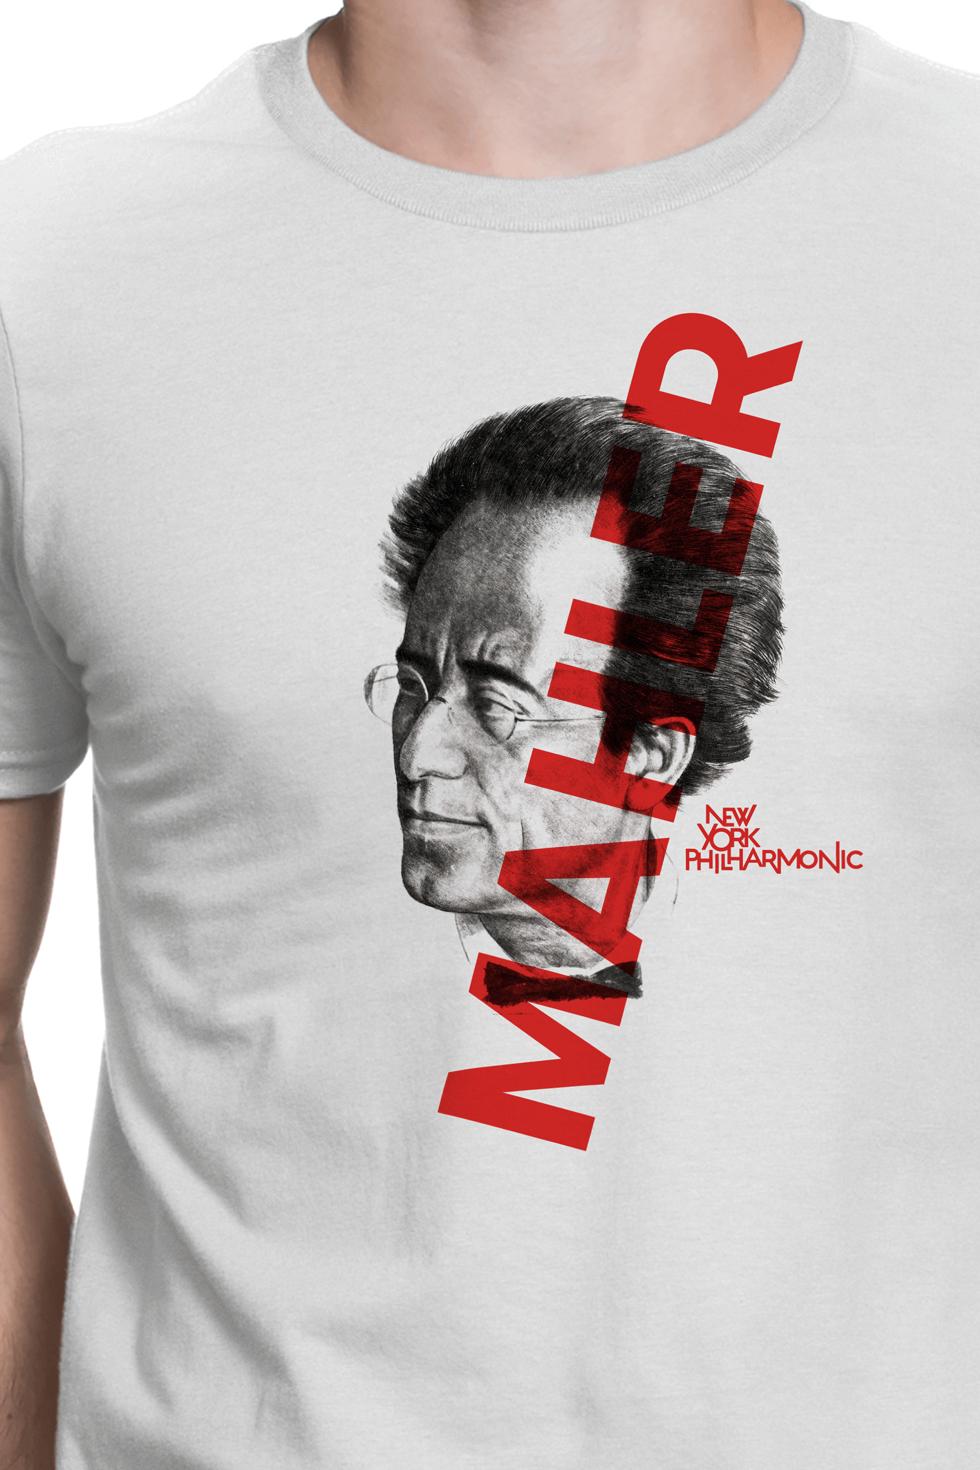 NYPhil Mahler tee